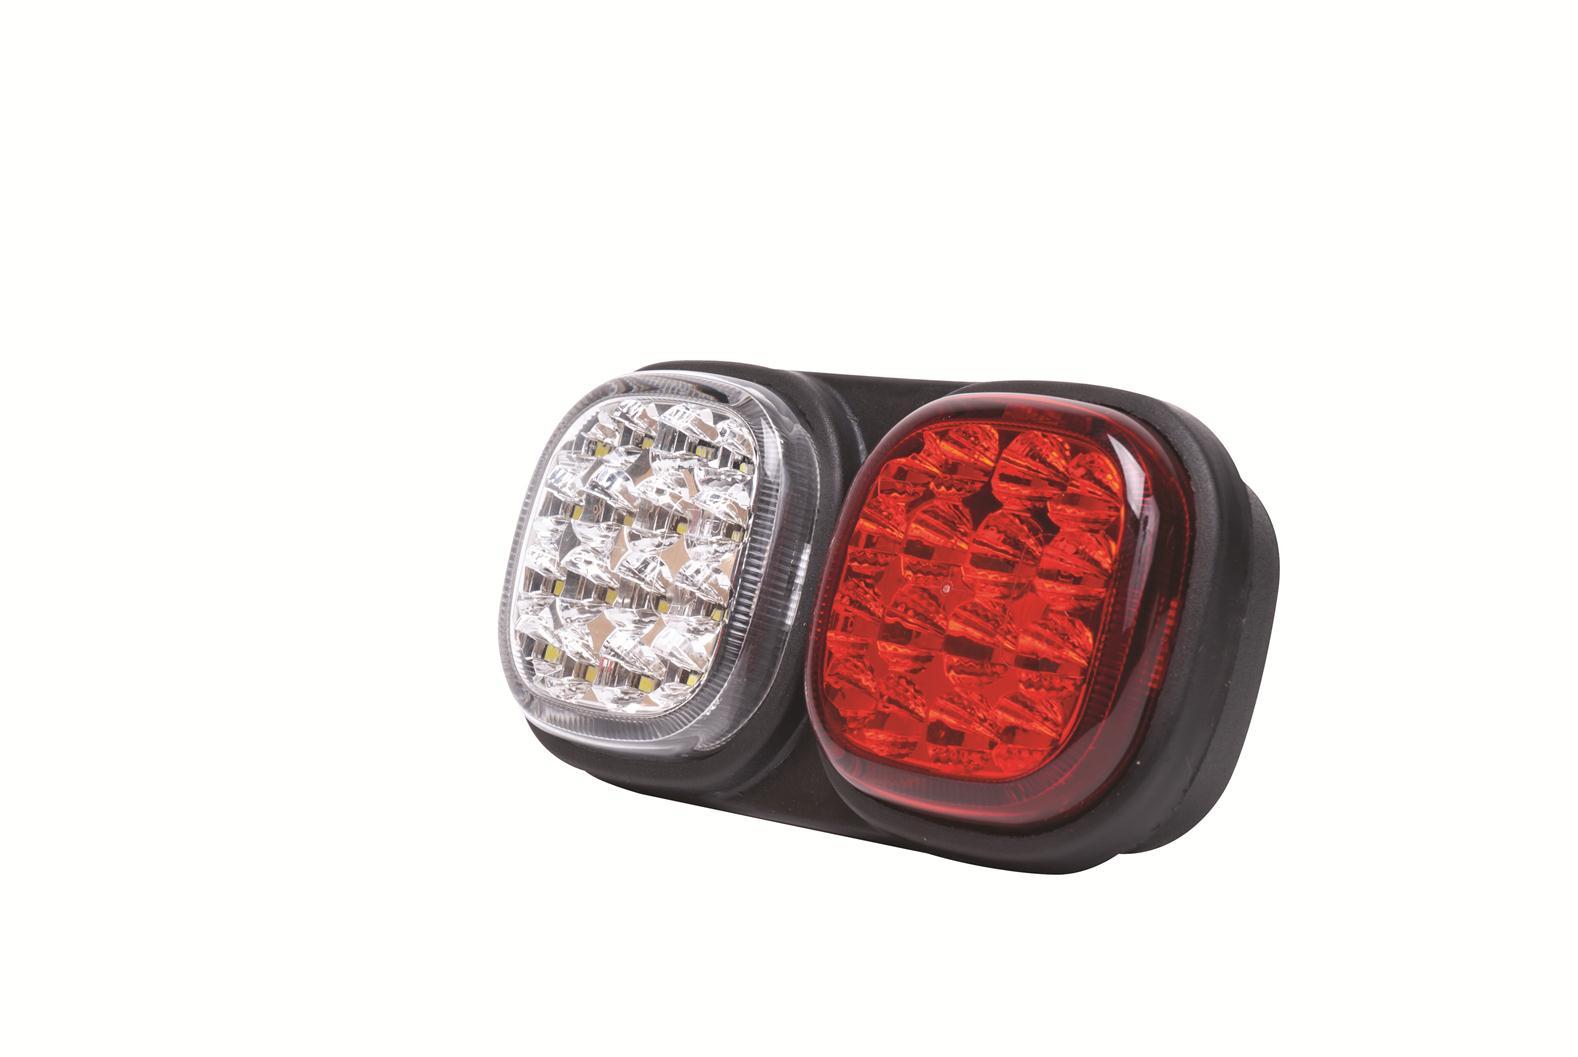 Britax L12 LED Rear Lamps